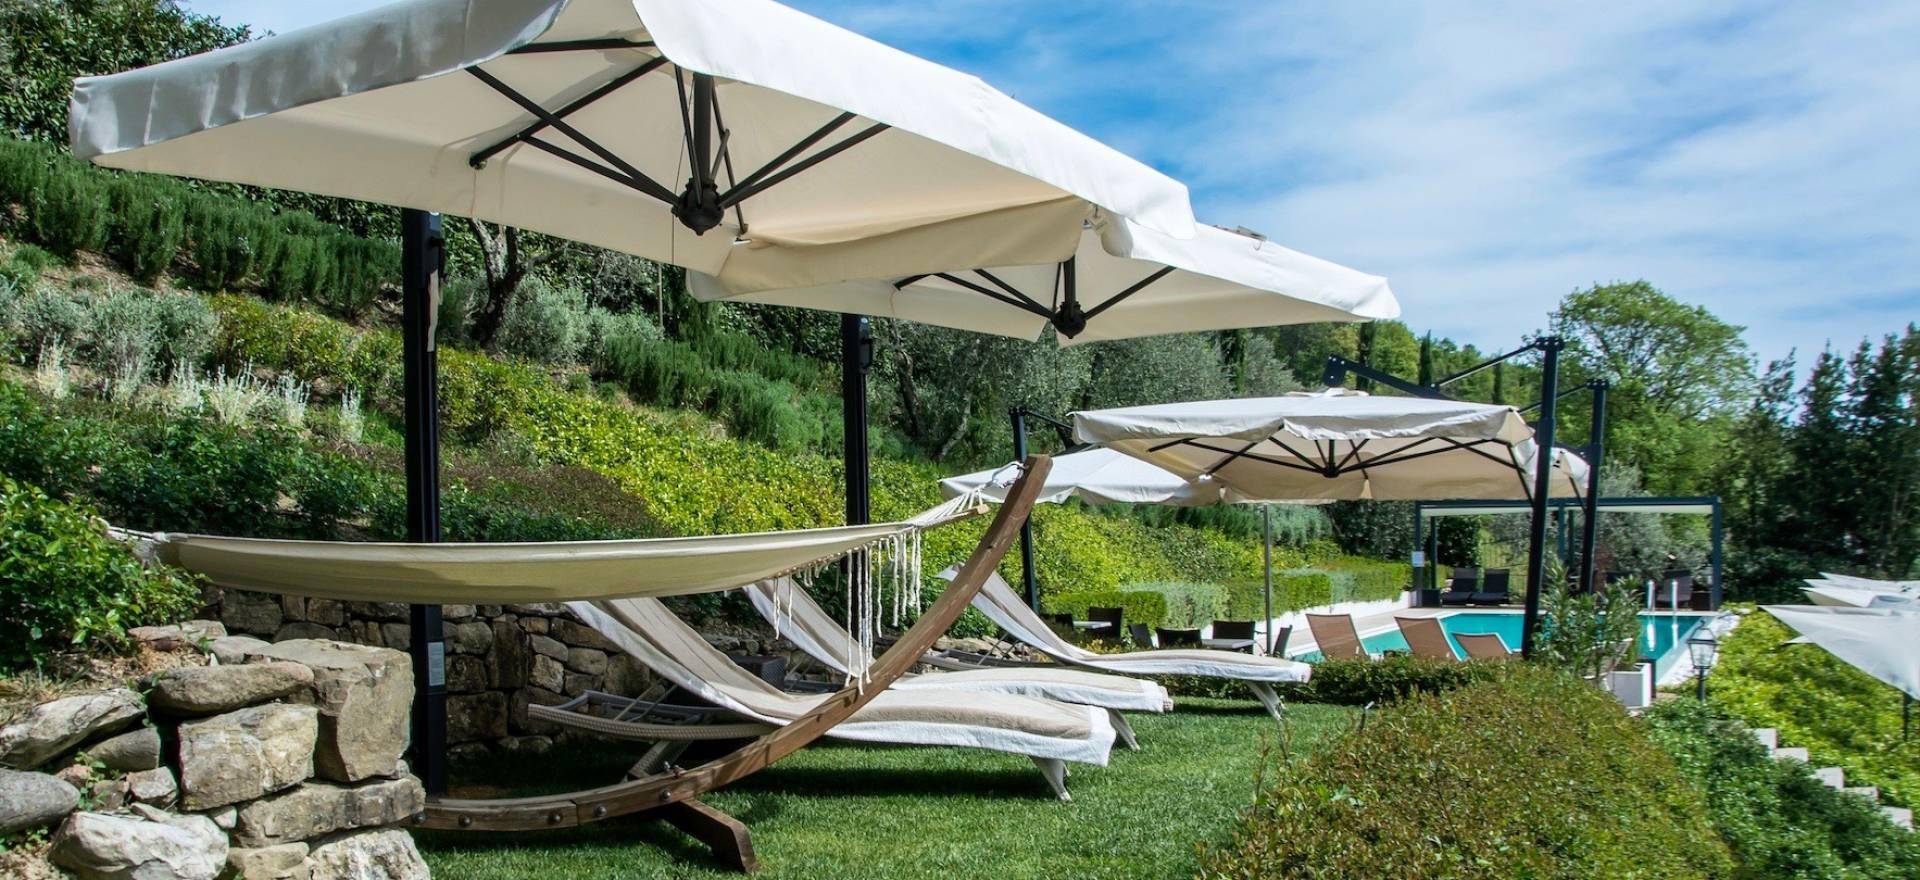 Agriturismo Toscana Agriturismo in villa signorile tra Firenze e Lucca